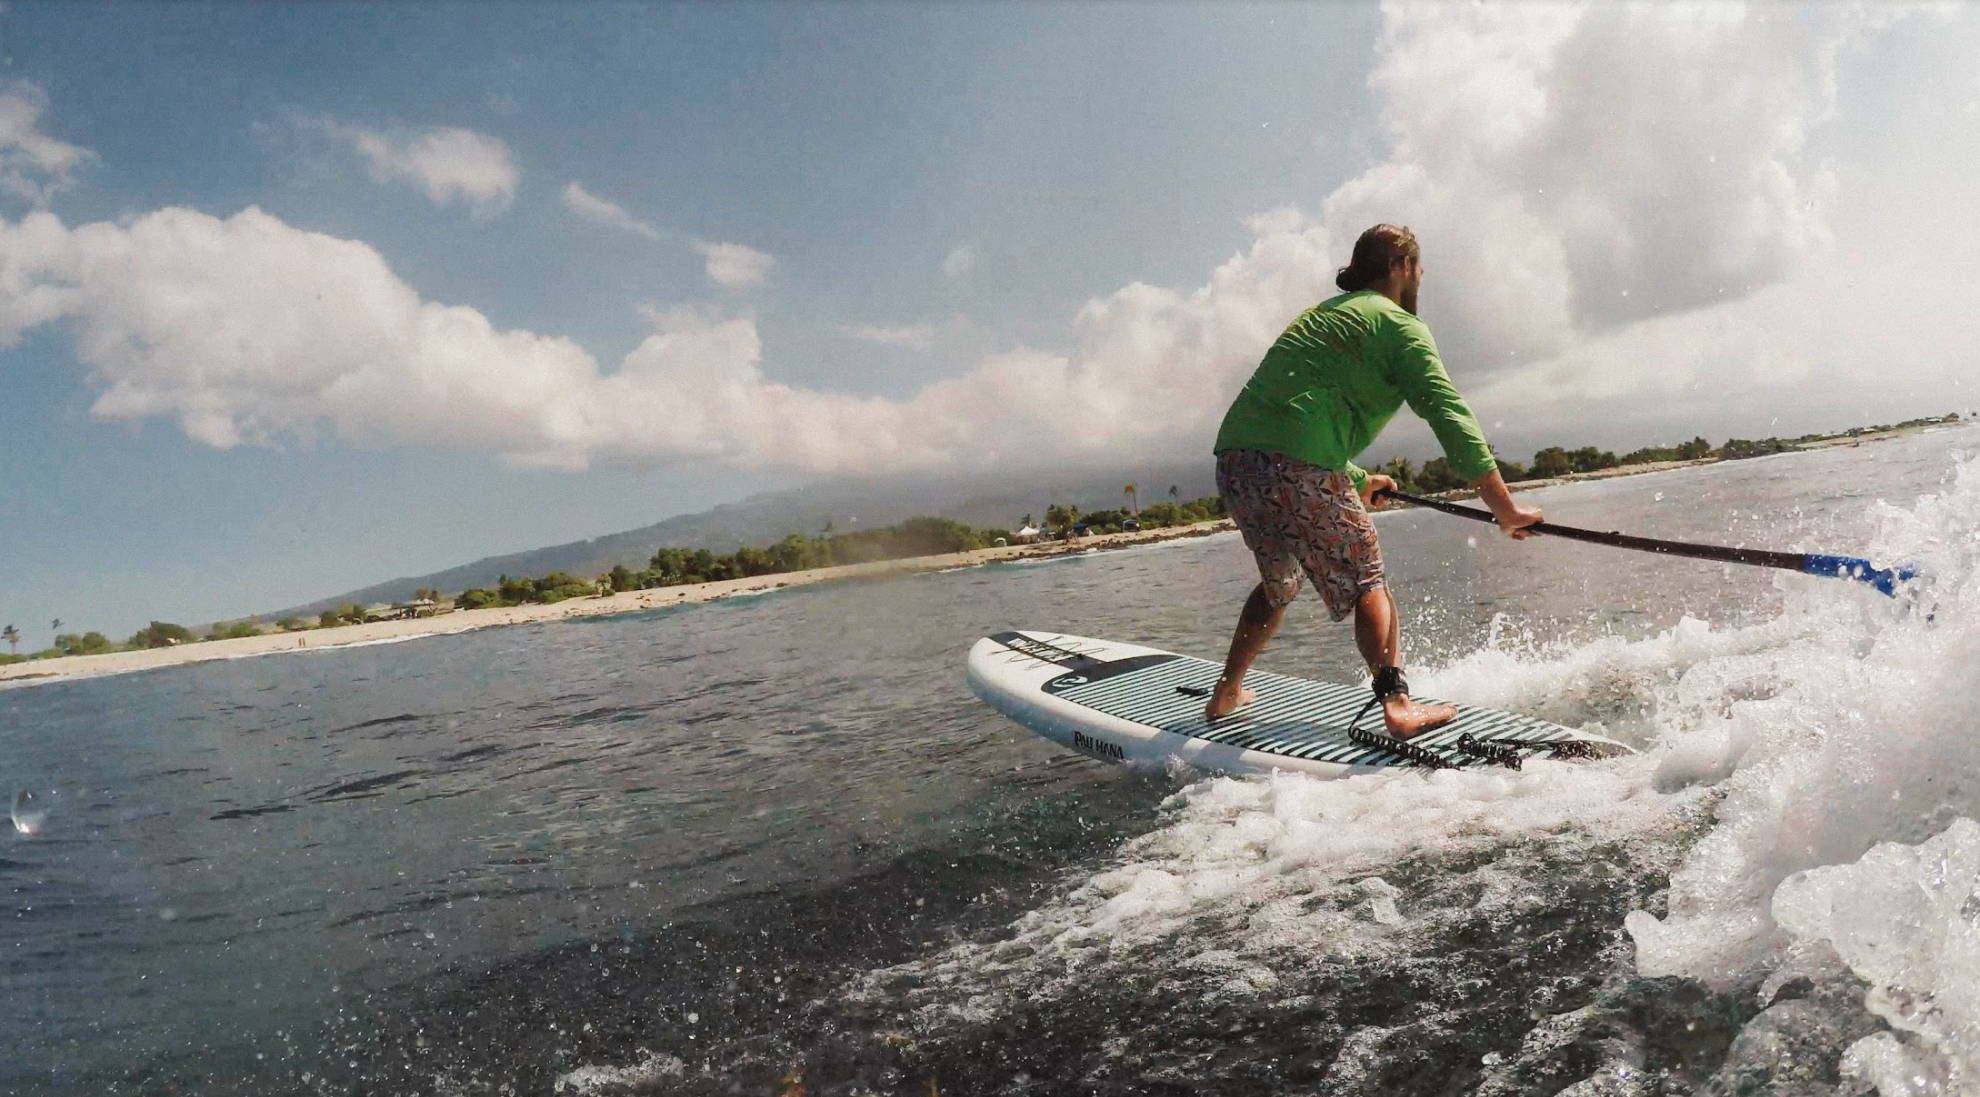 Kevin Surfing Big EZ Air